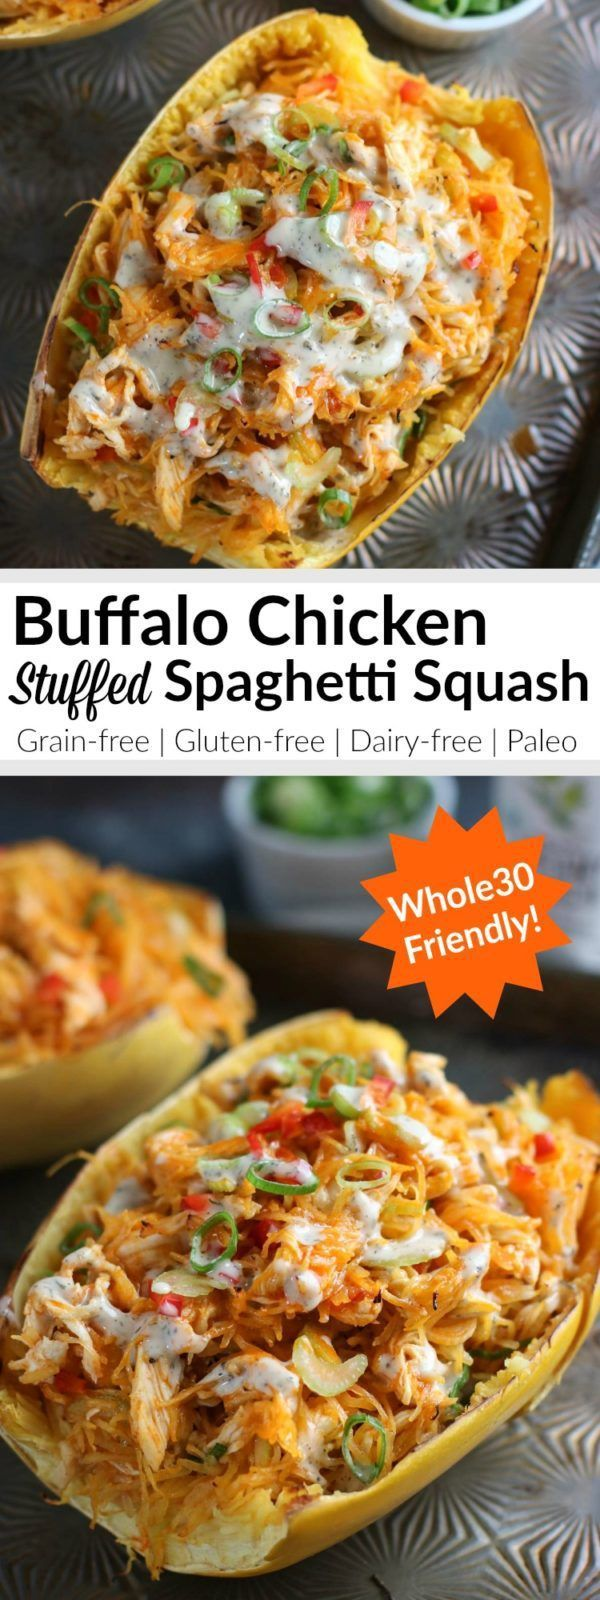 Buffalo Chicken Stuffed Spaghetti Squash - nourish move love | health + fitness blog - #Blog #Buffal...